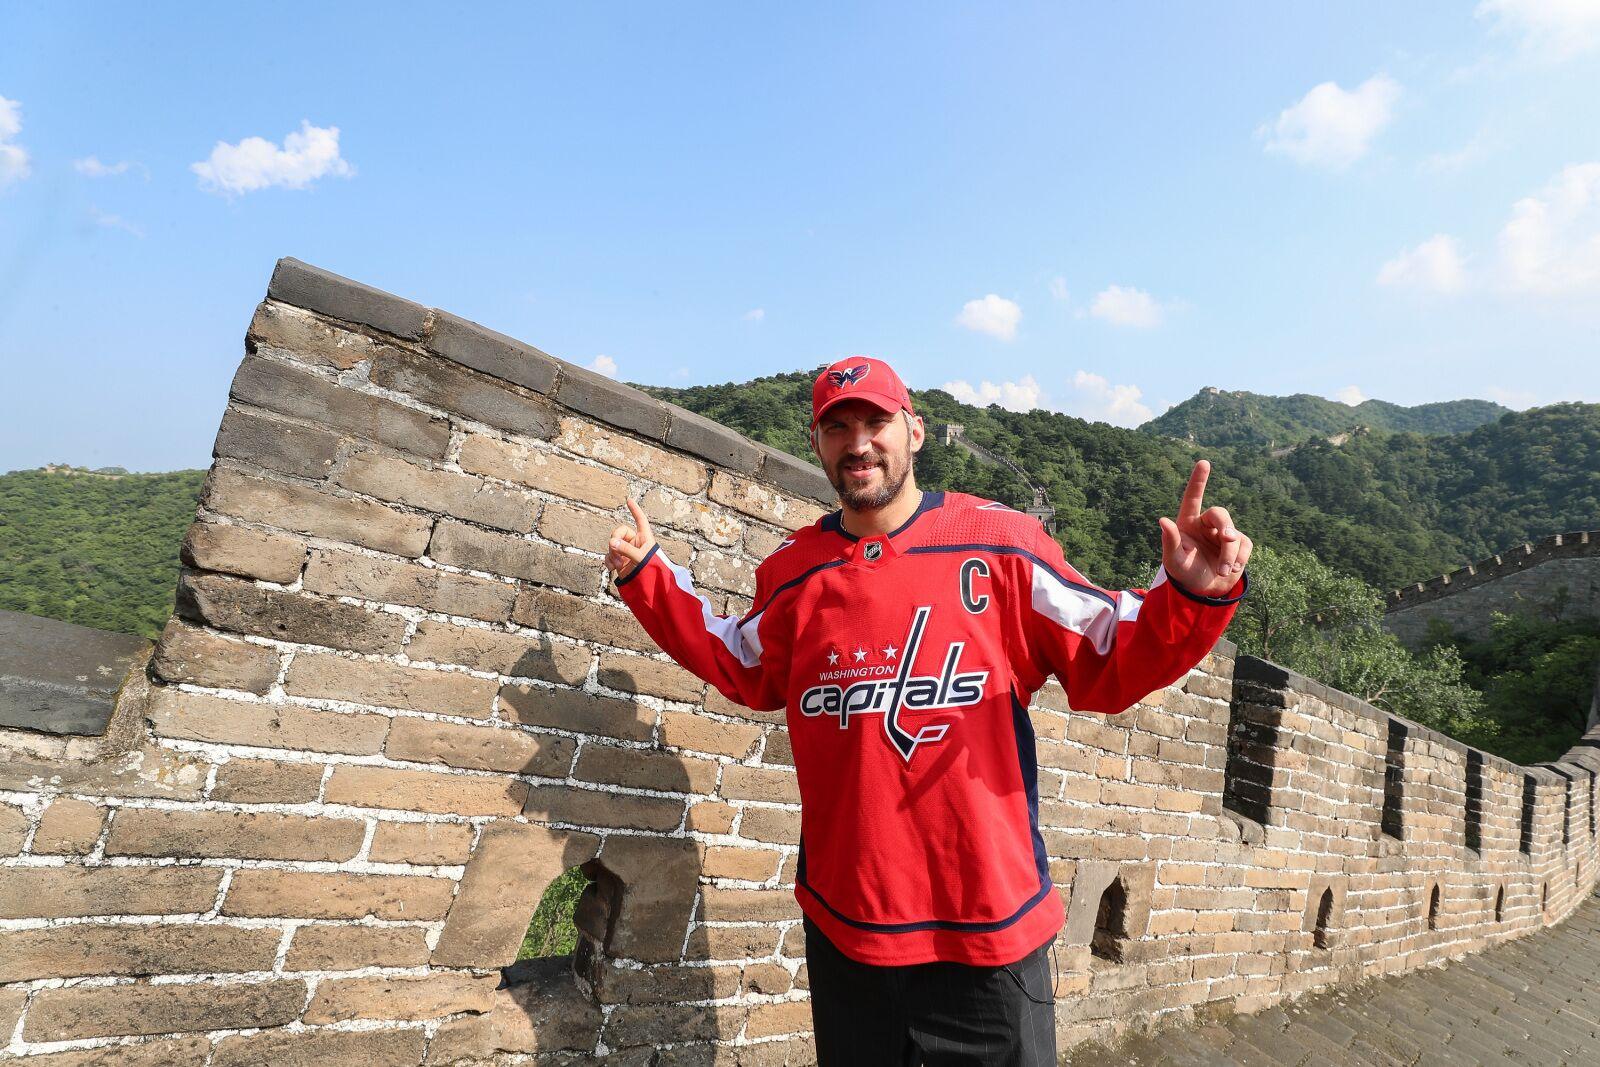 Washington Capitals: Alex Ovechkin checks out Great Wall of China